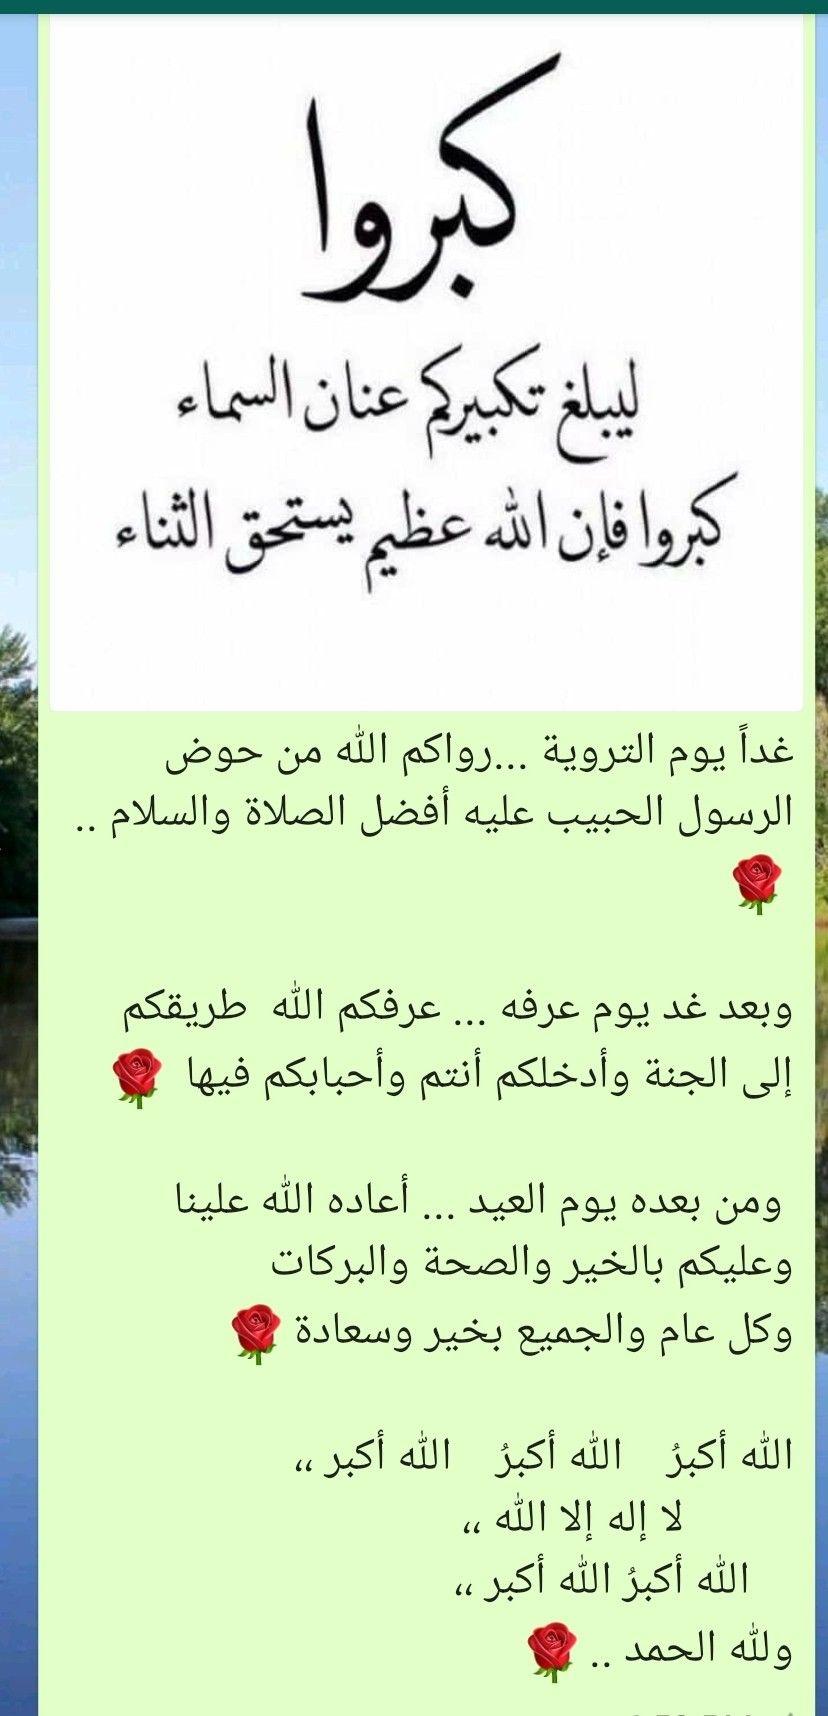 Desertrose في ودائعك دائم ا ياااارب أرواحنا وأهلنا ومن نحب Islam Facts Islam Beliefs Islamic Phrases